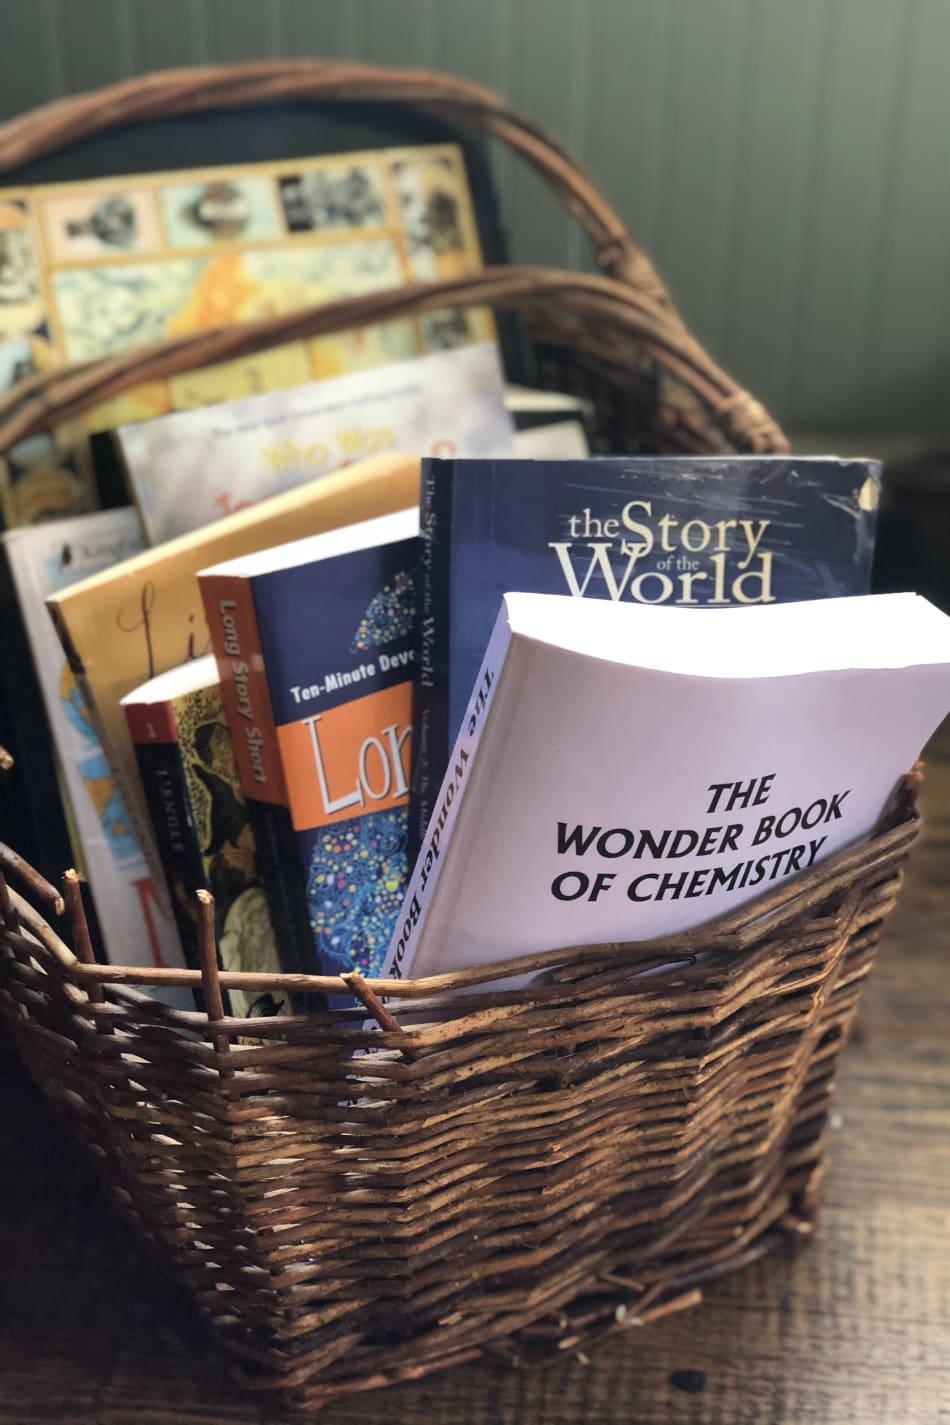 basket of school books